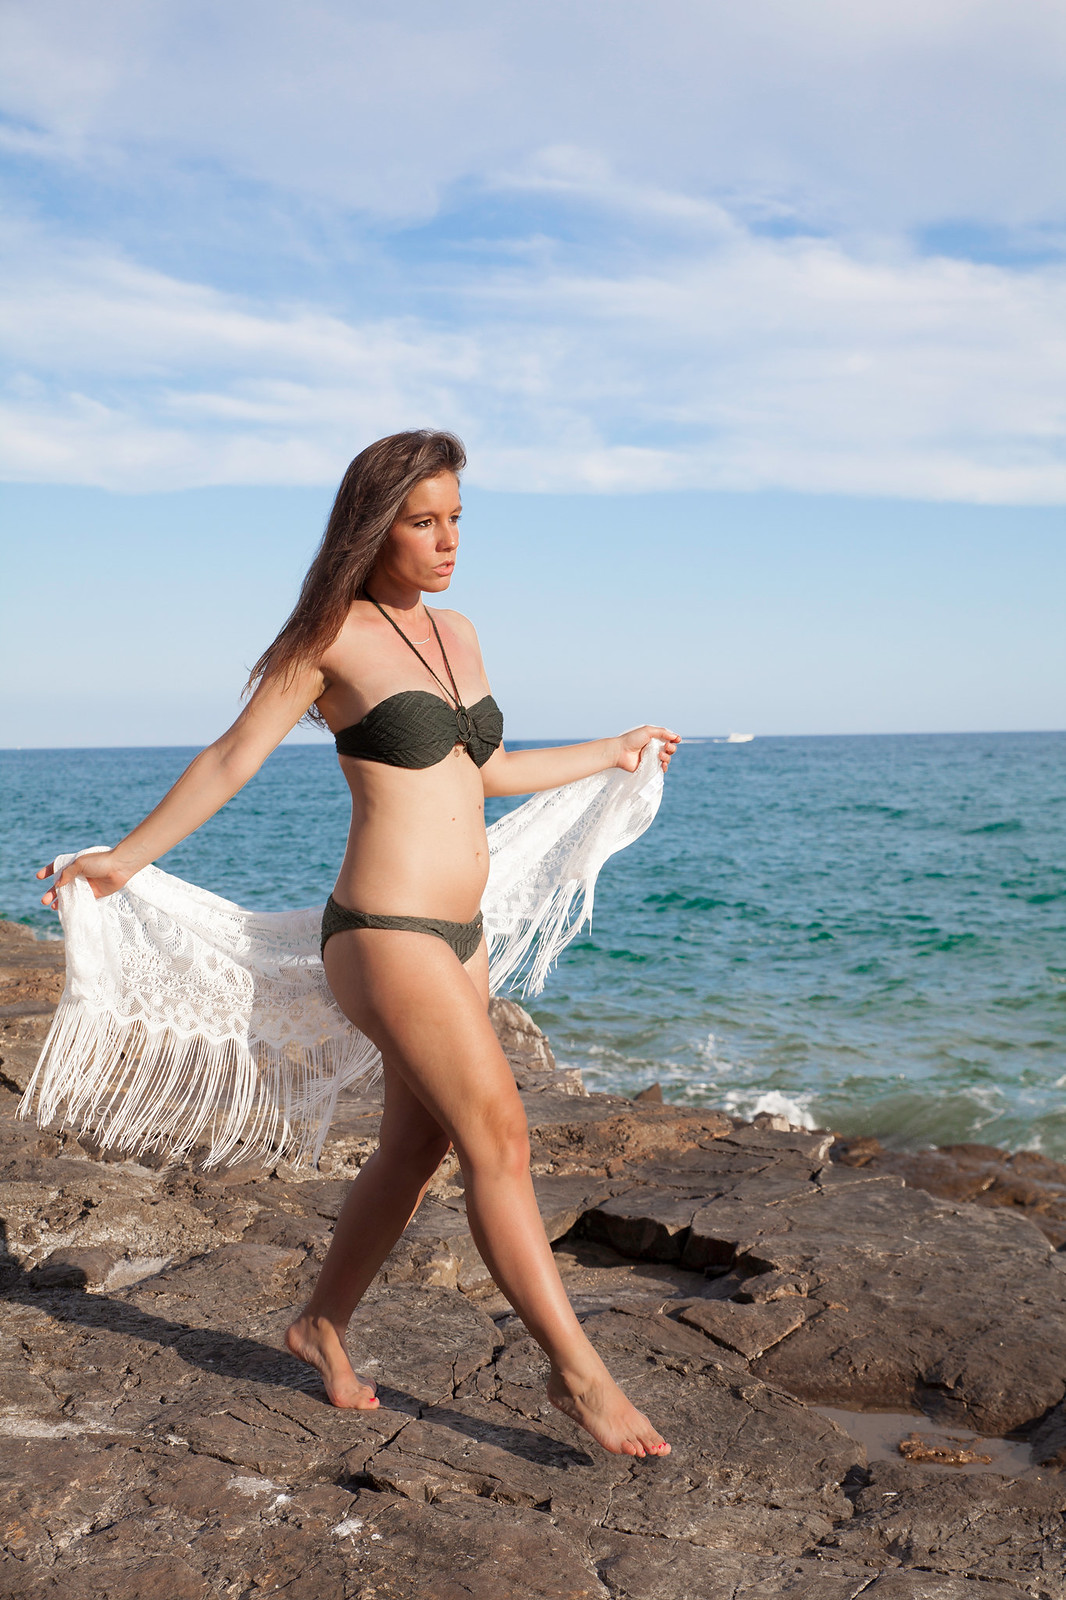 02_Hunker_Moller_Bikini_Comodo_embarazada_theguestgirl_laura_santolaria_influencer_moda_embarazada